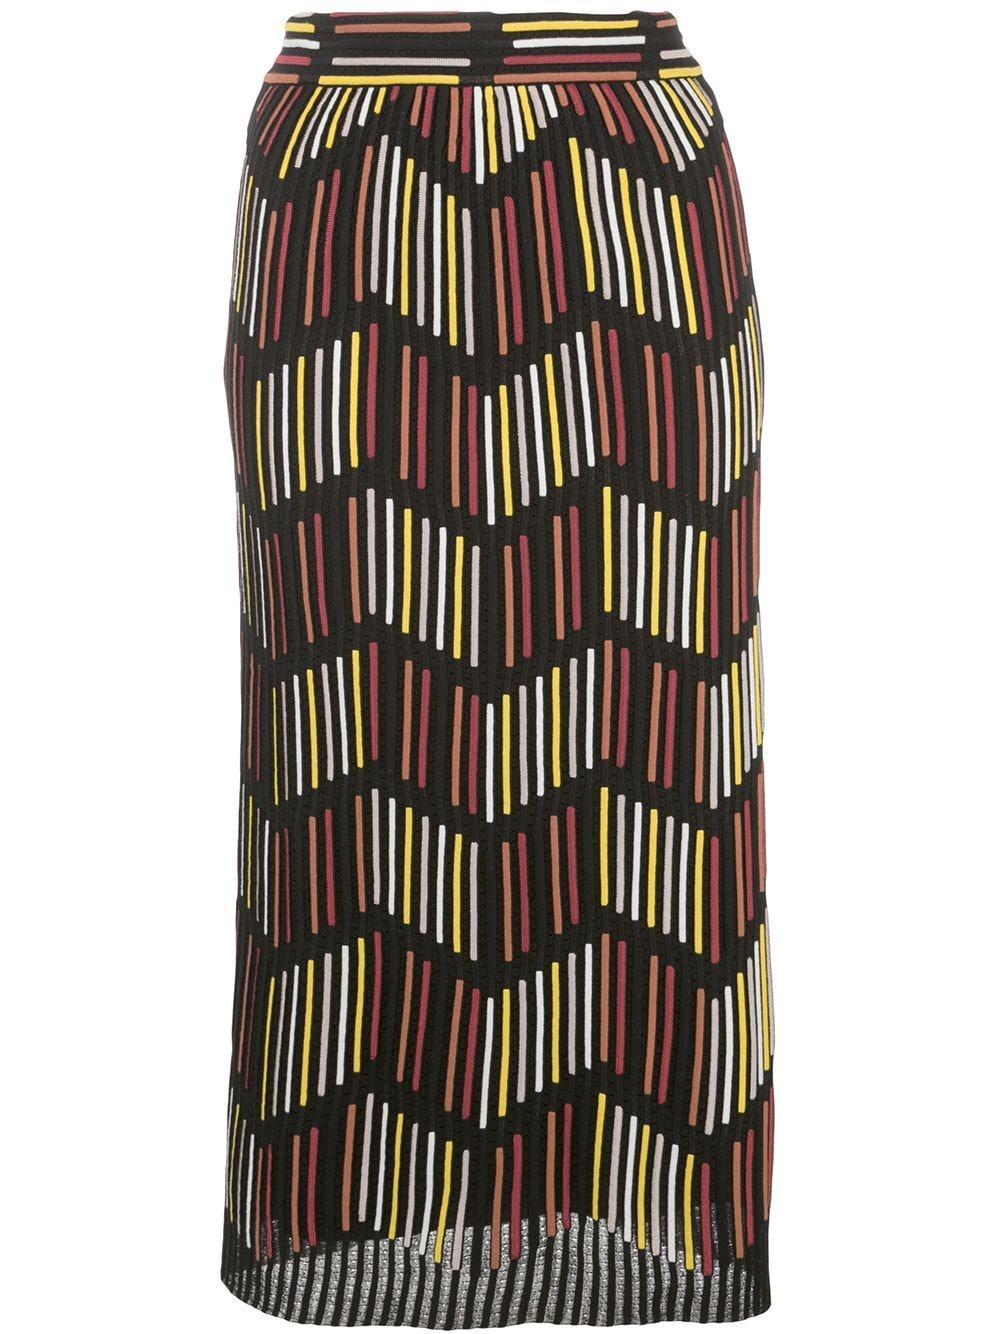 M Missoni юбка-карандаш с завышенной талией